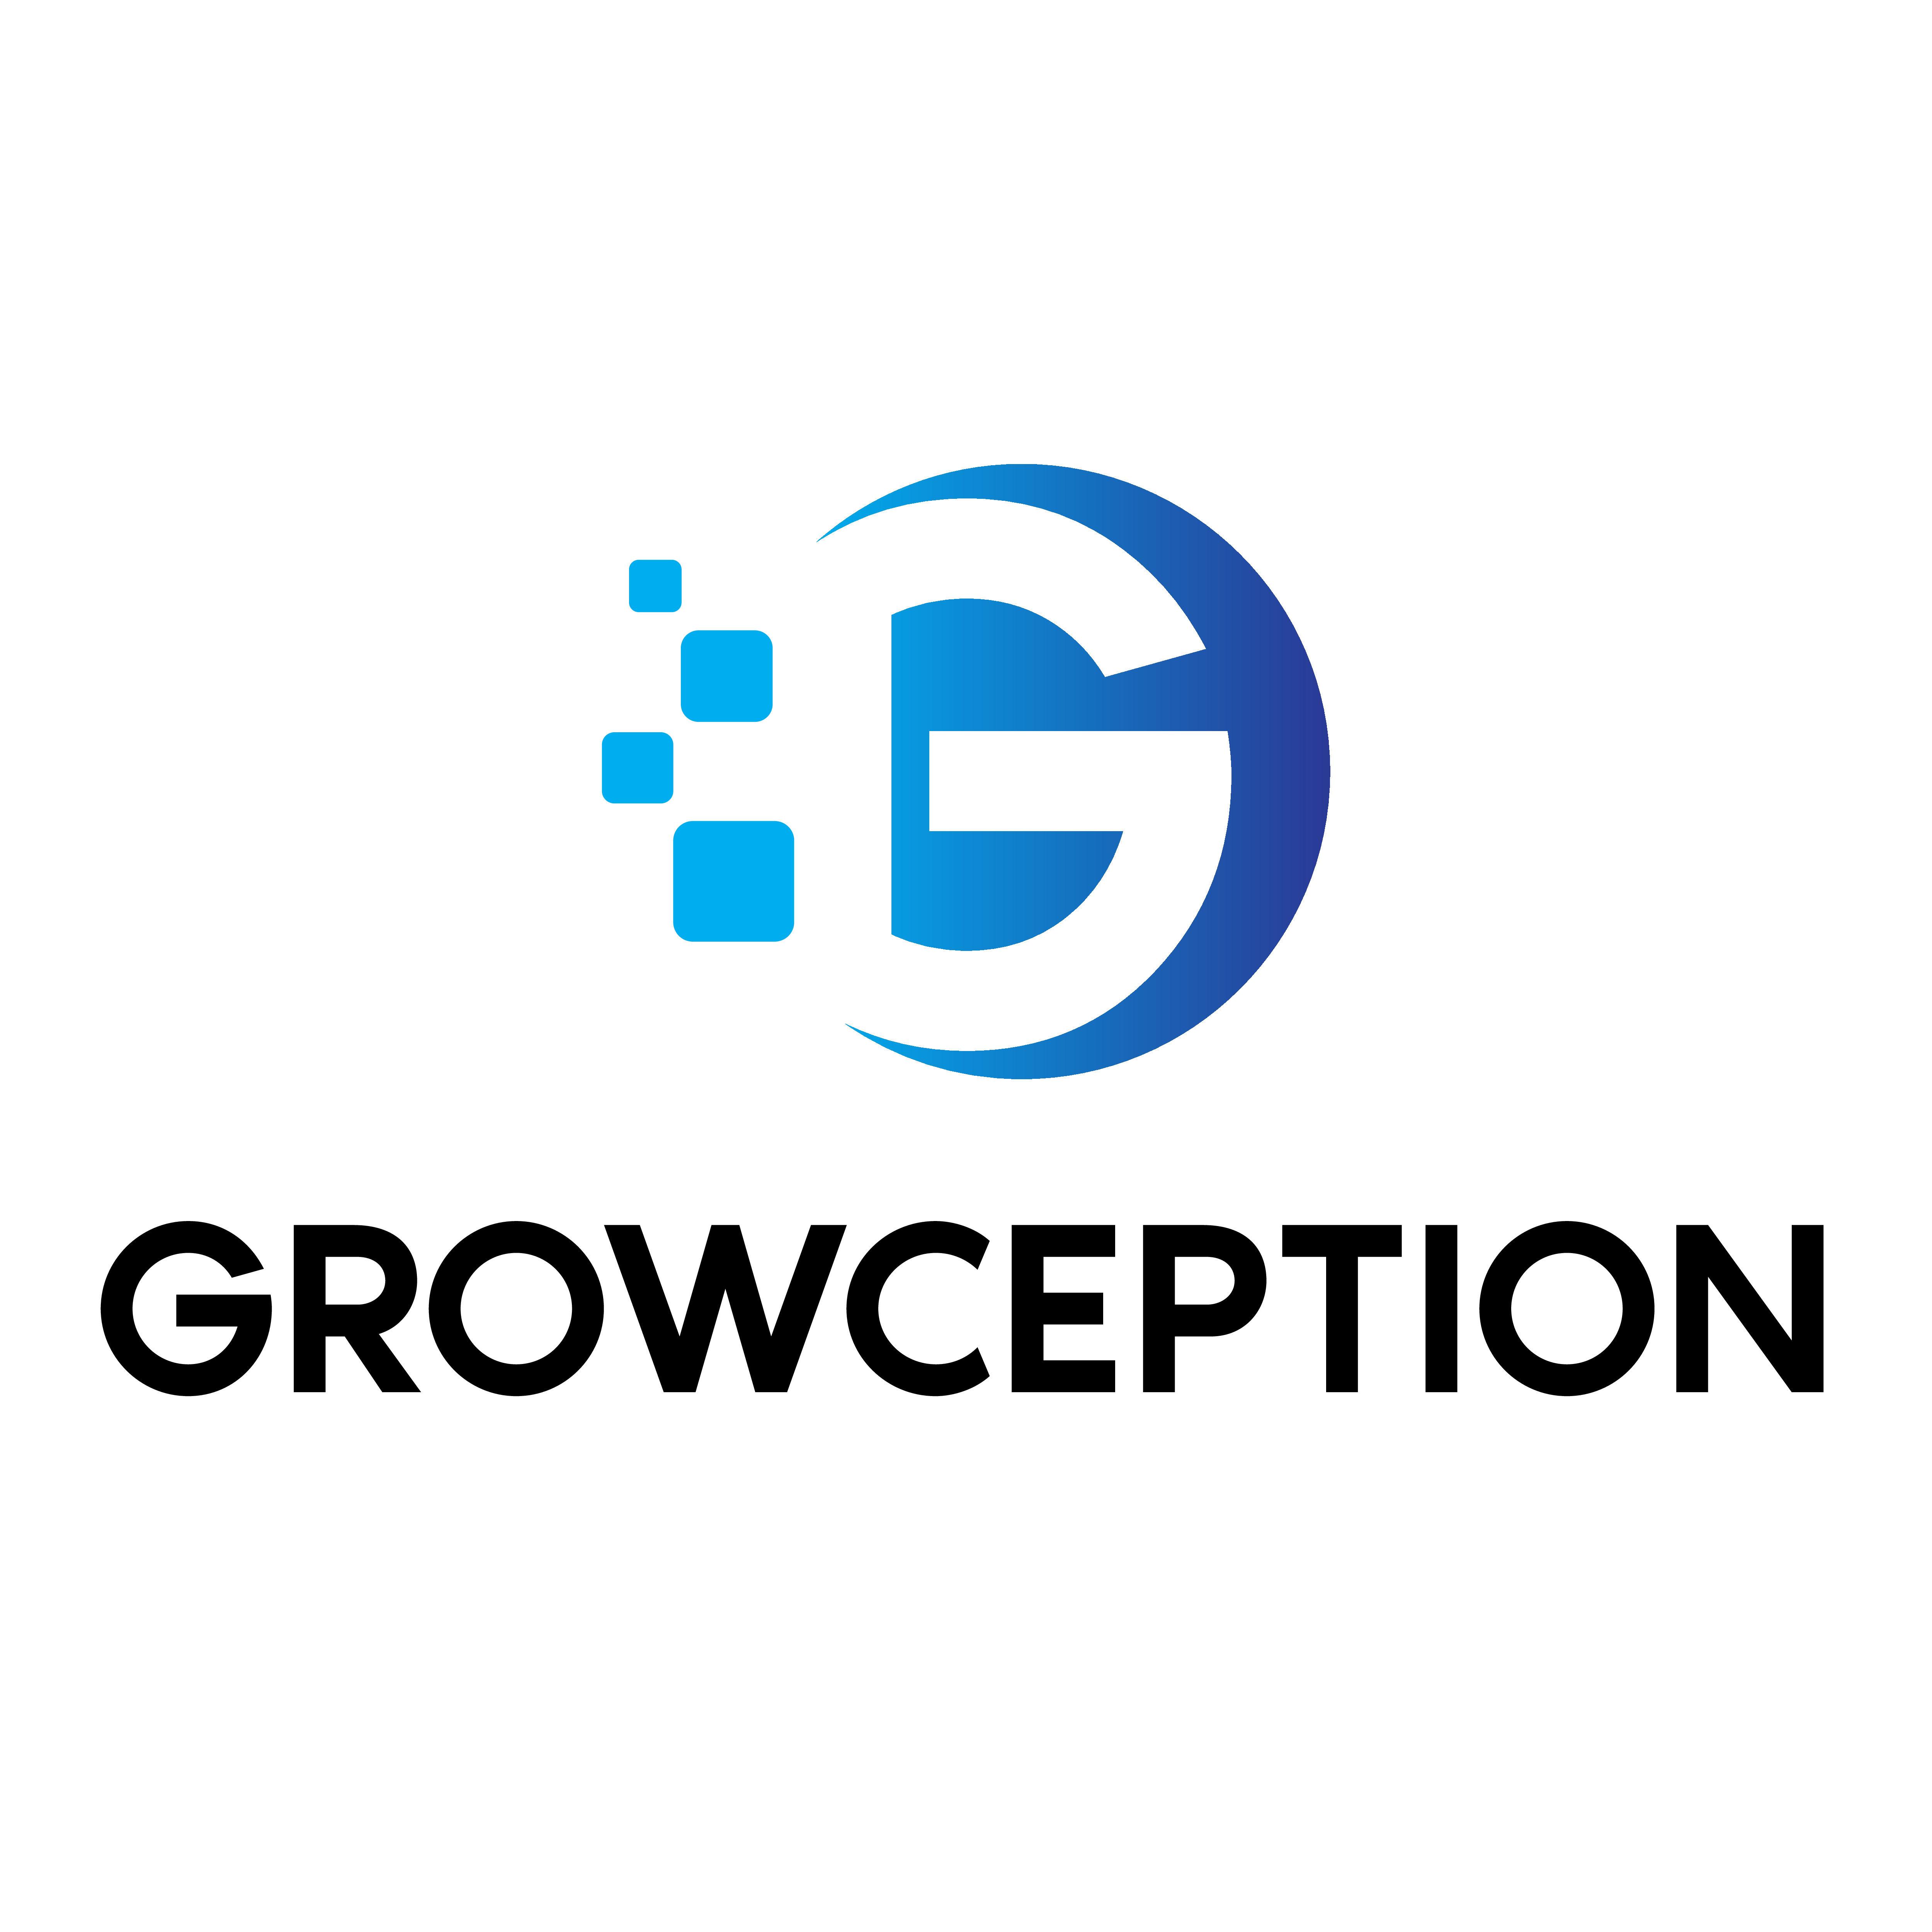 Growception Logo